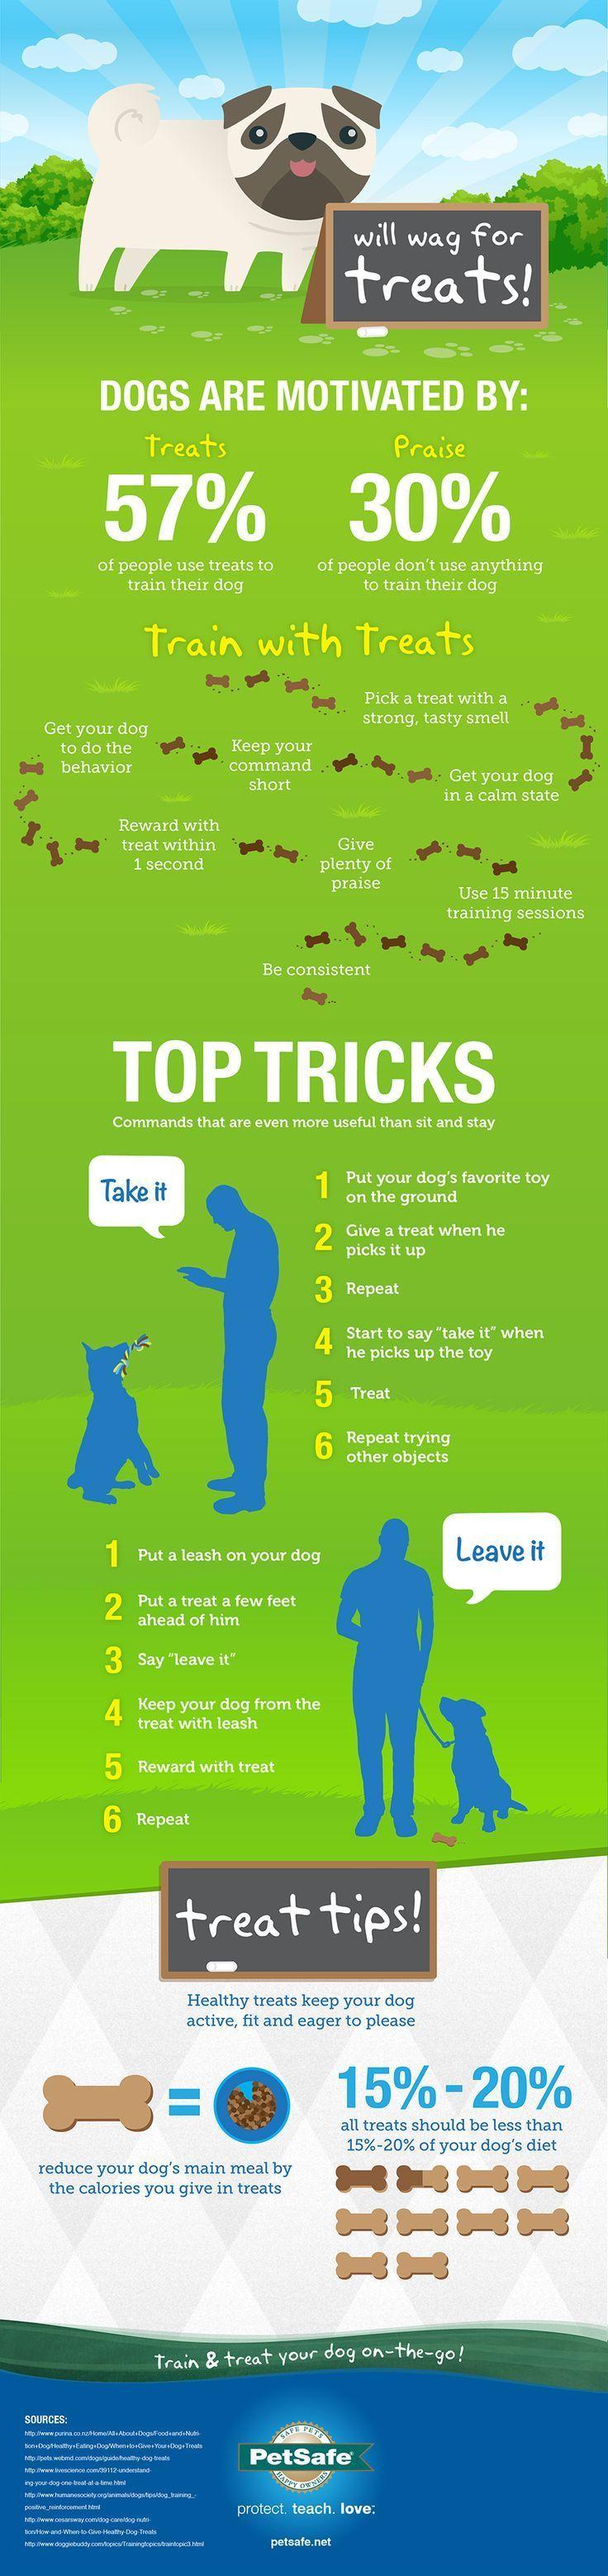 Hunde lernen leichter mit Leckerlis! | petsafe.net